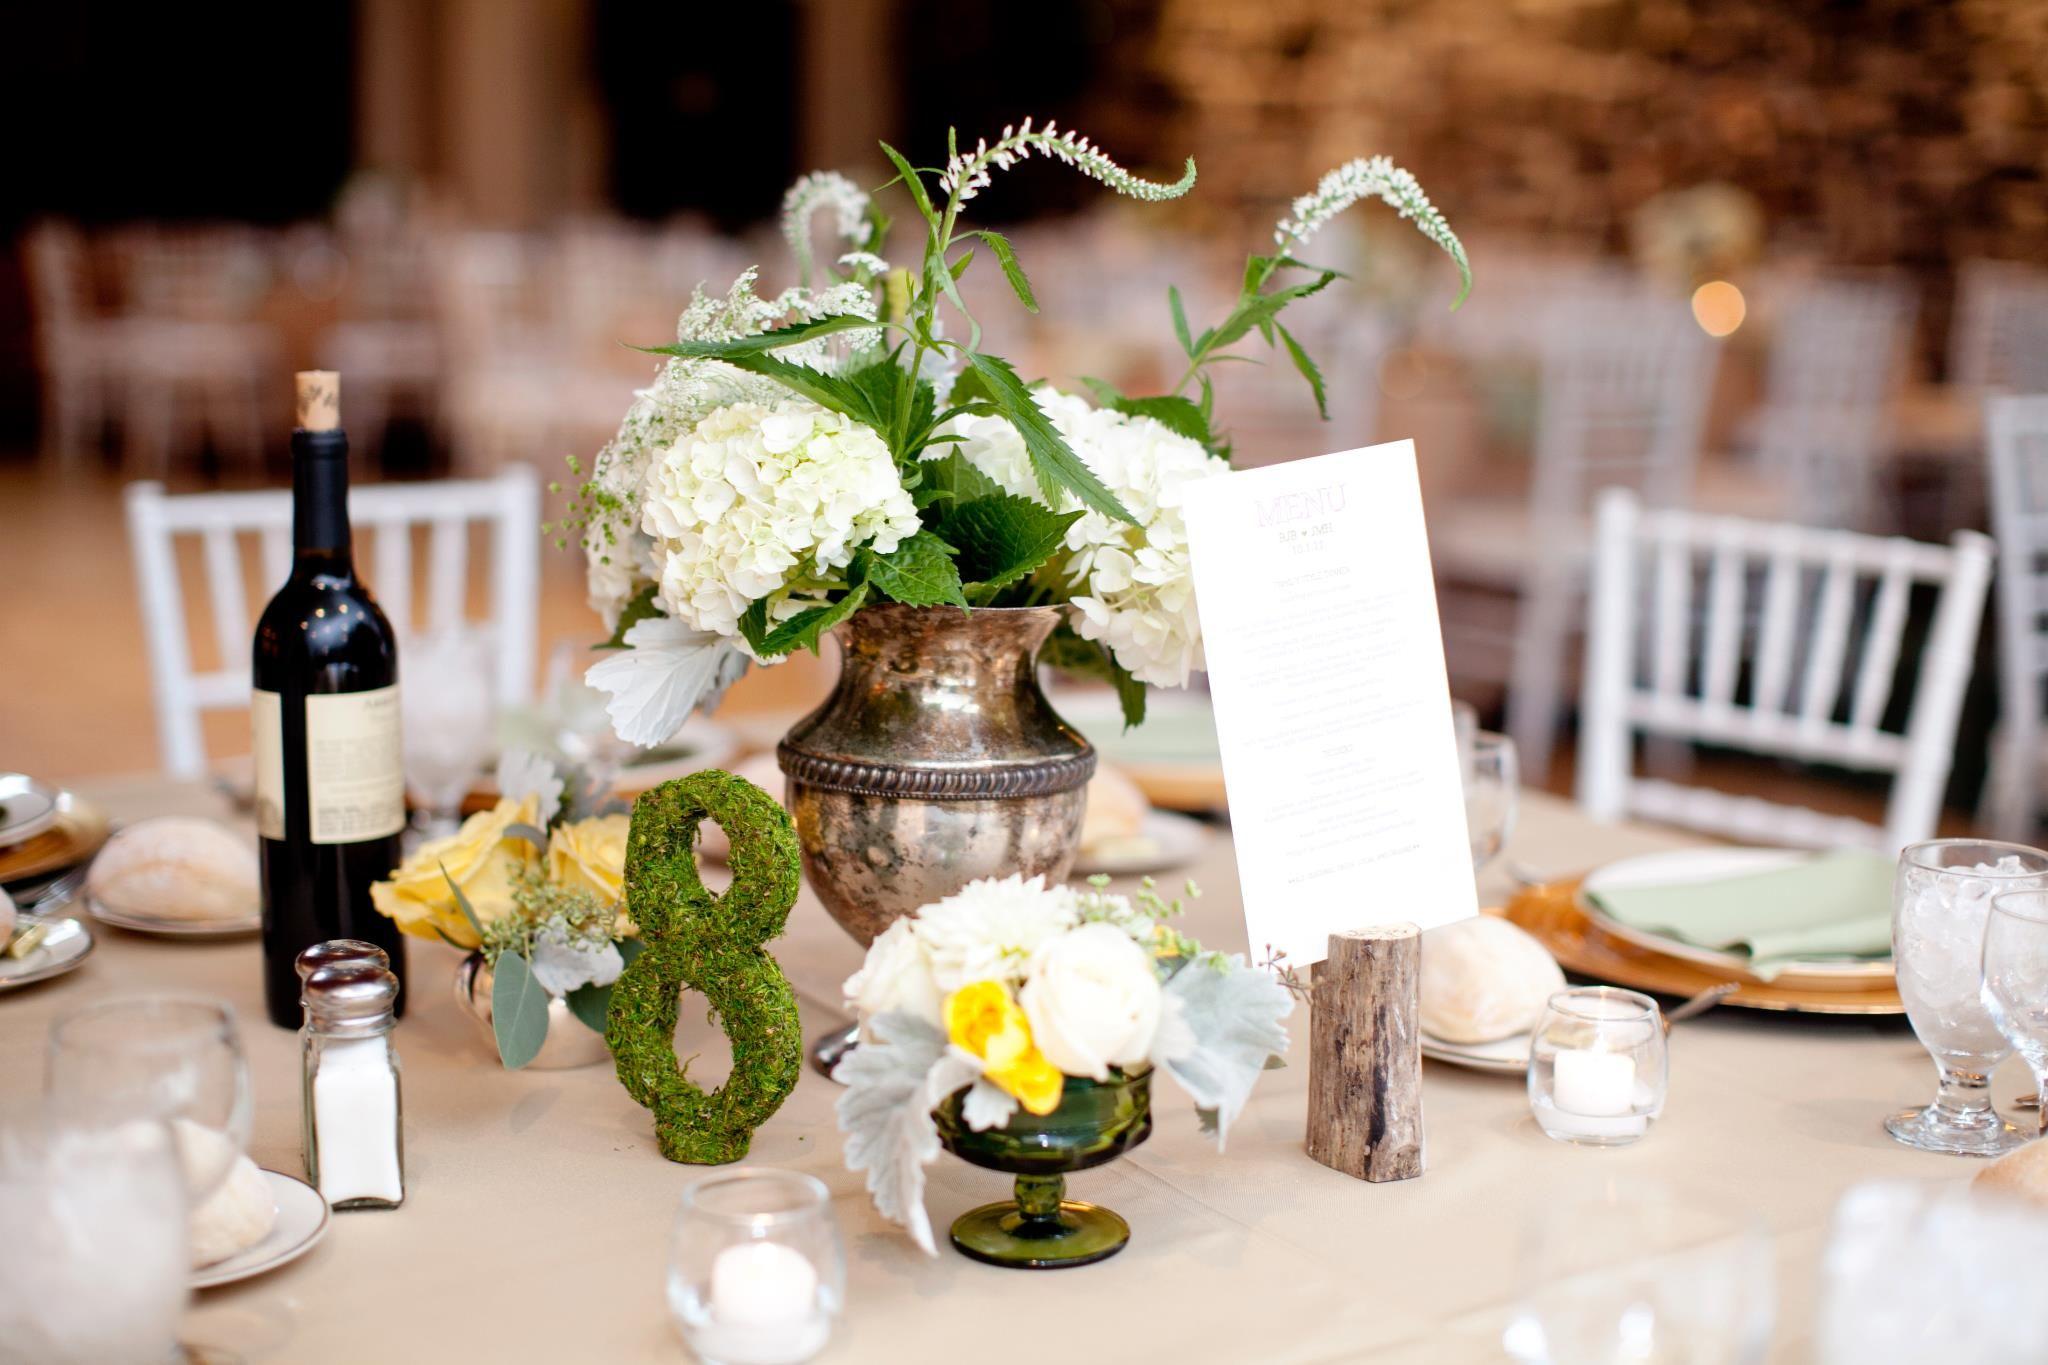 La Banque At The Seaplane Base Wedding Havre De Grace Weddings Natural Flowers In Vintage Silver Nature Wedding La Wedding County Wedding